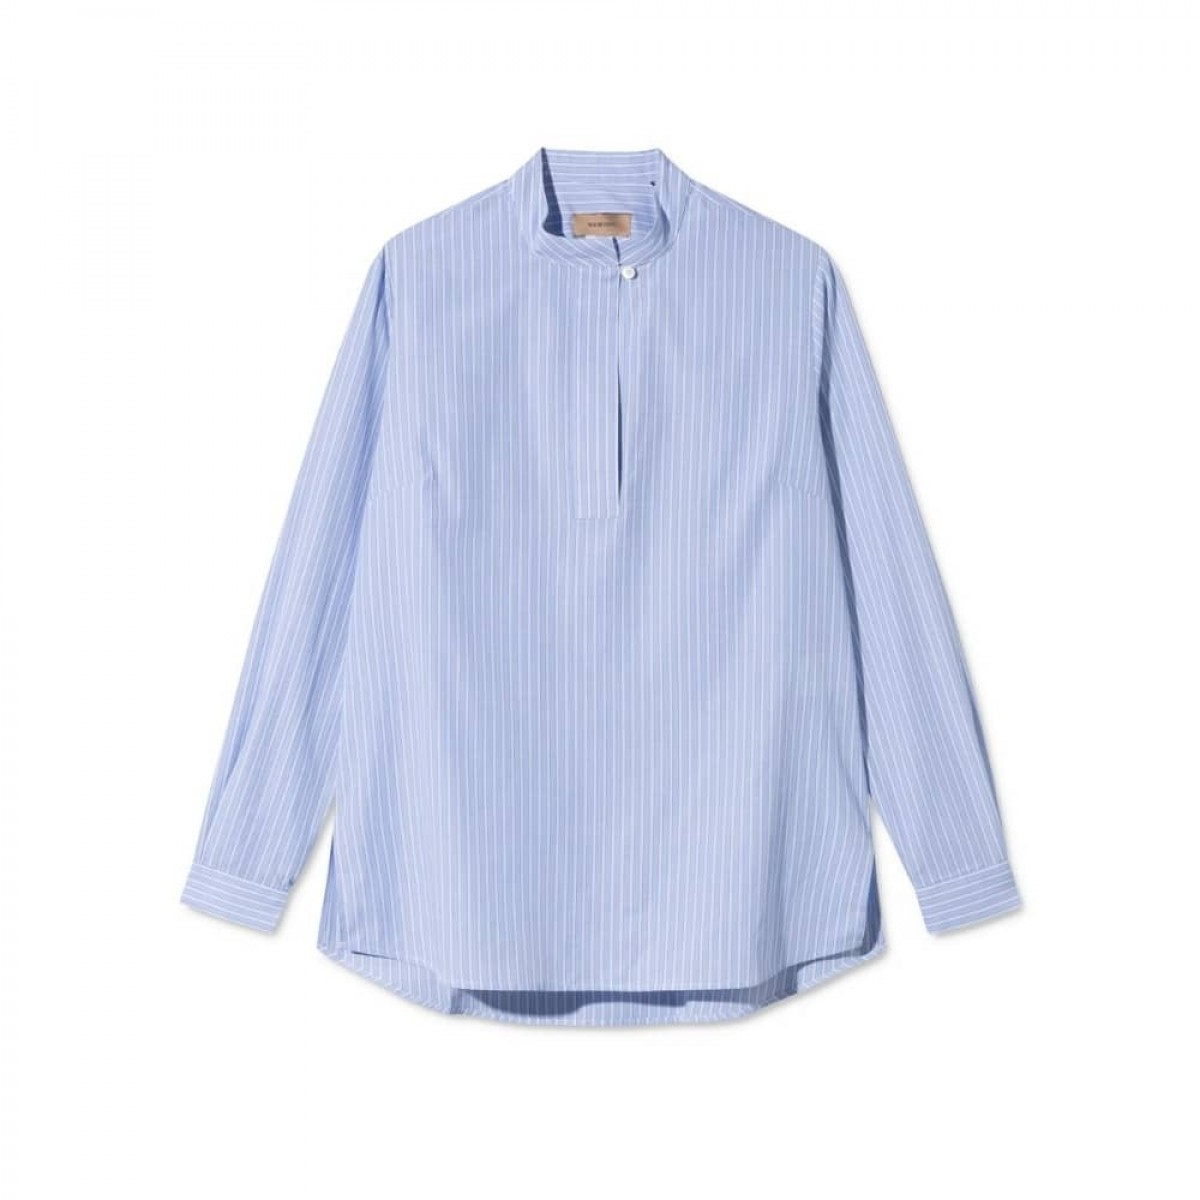 saba skjorte - blue/white